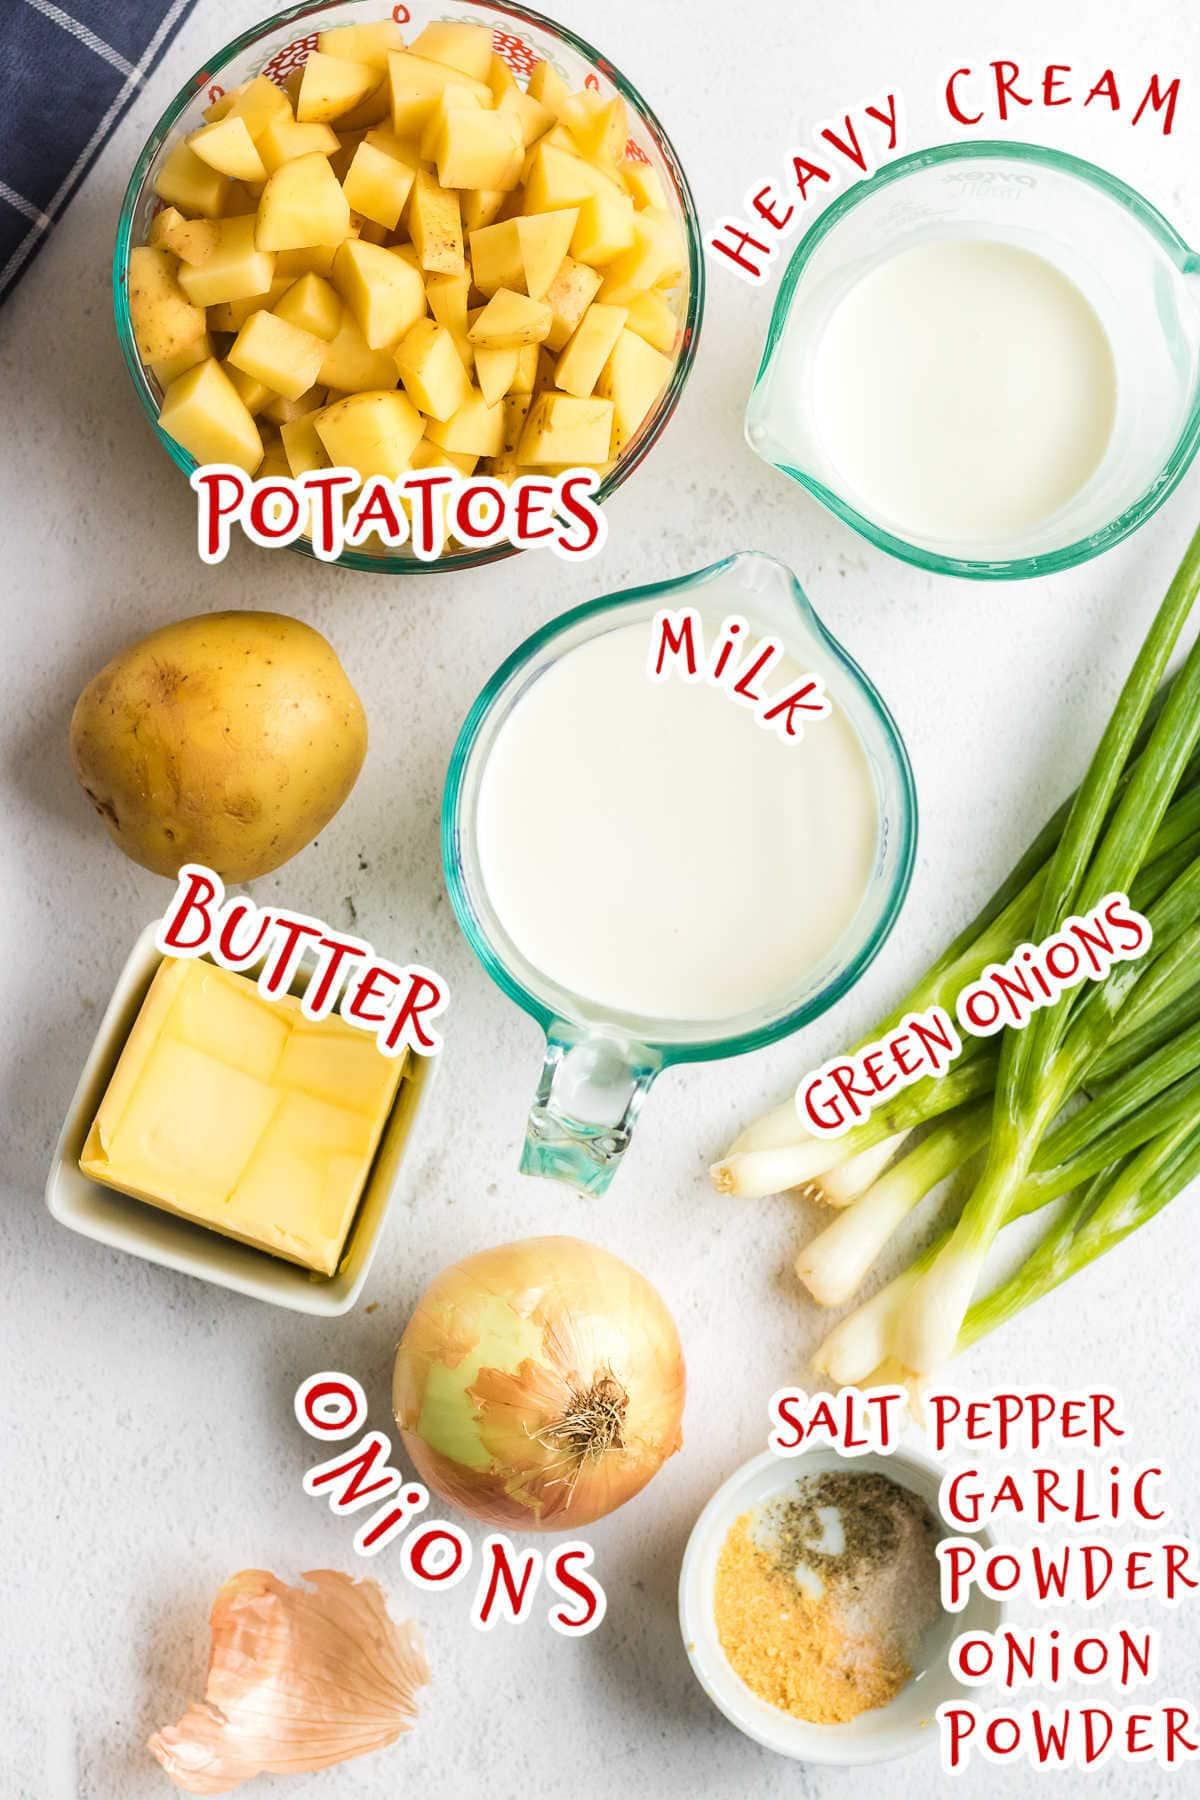 Labeled potato soup ingredients.